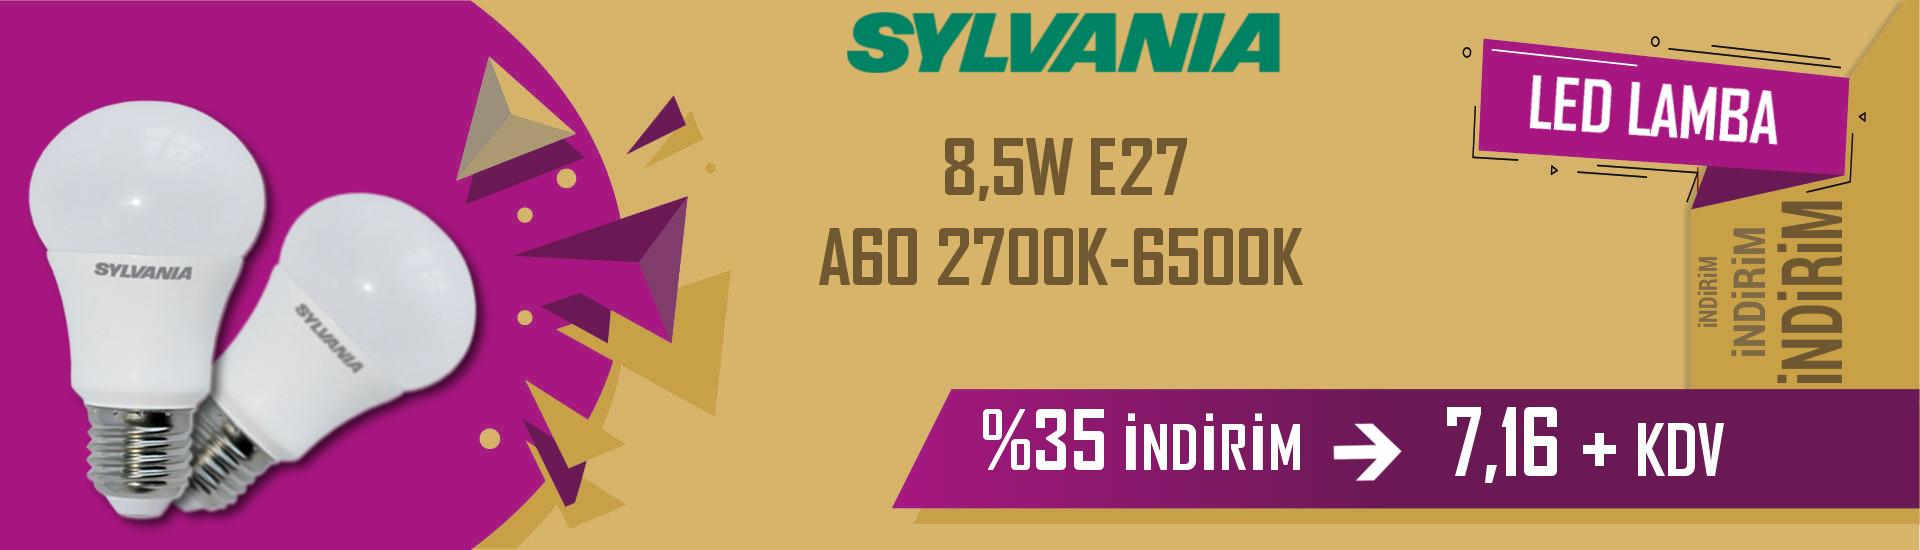 syl 8,5w